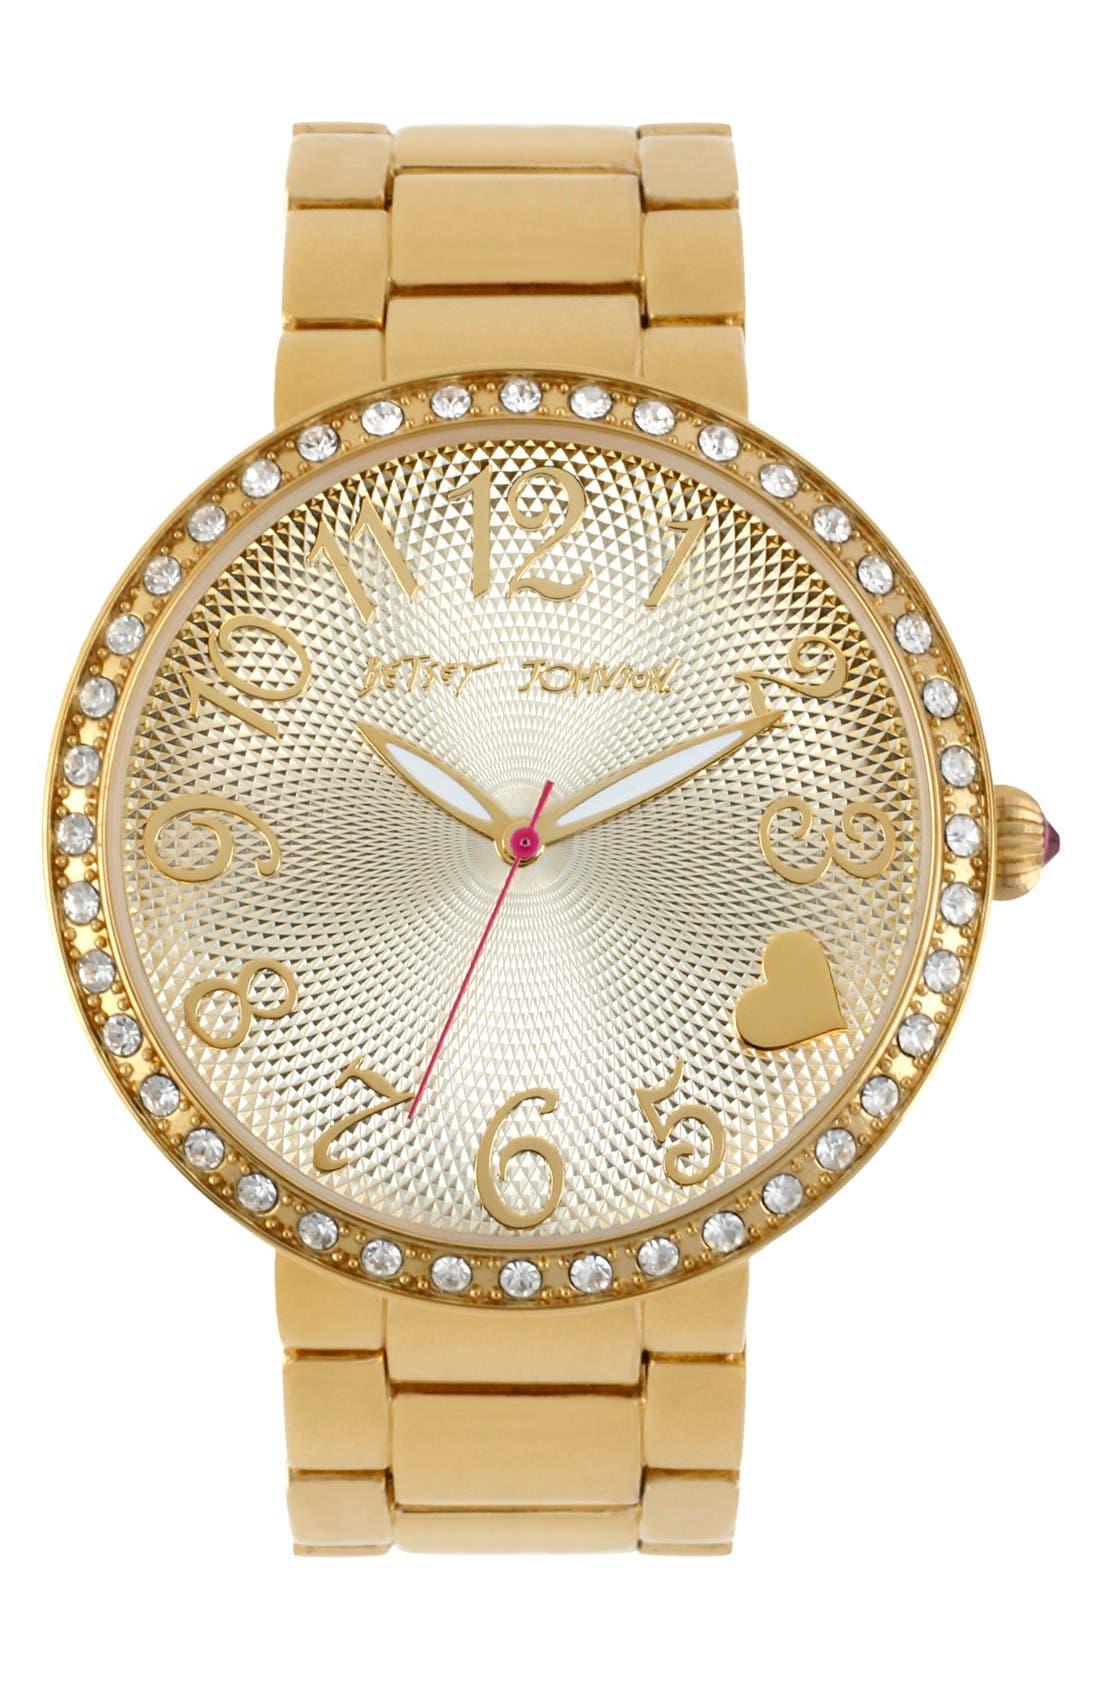 Main Image - Betsey Johnson Textured Dial Bracelet Watch, 43mm